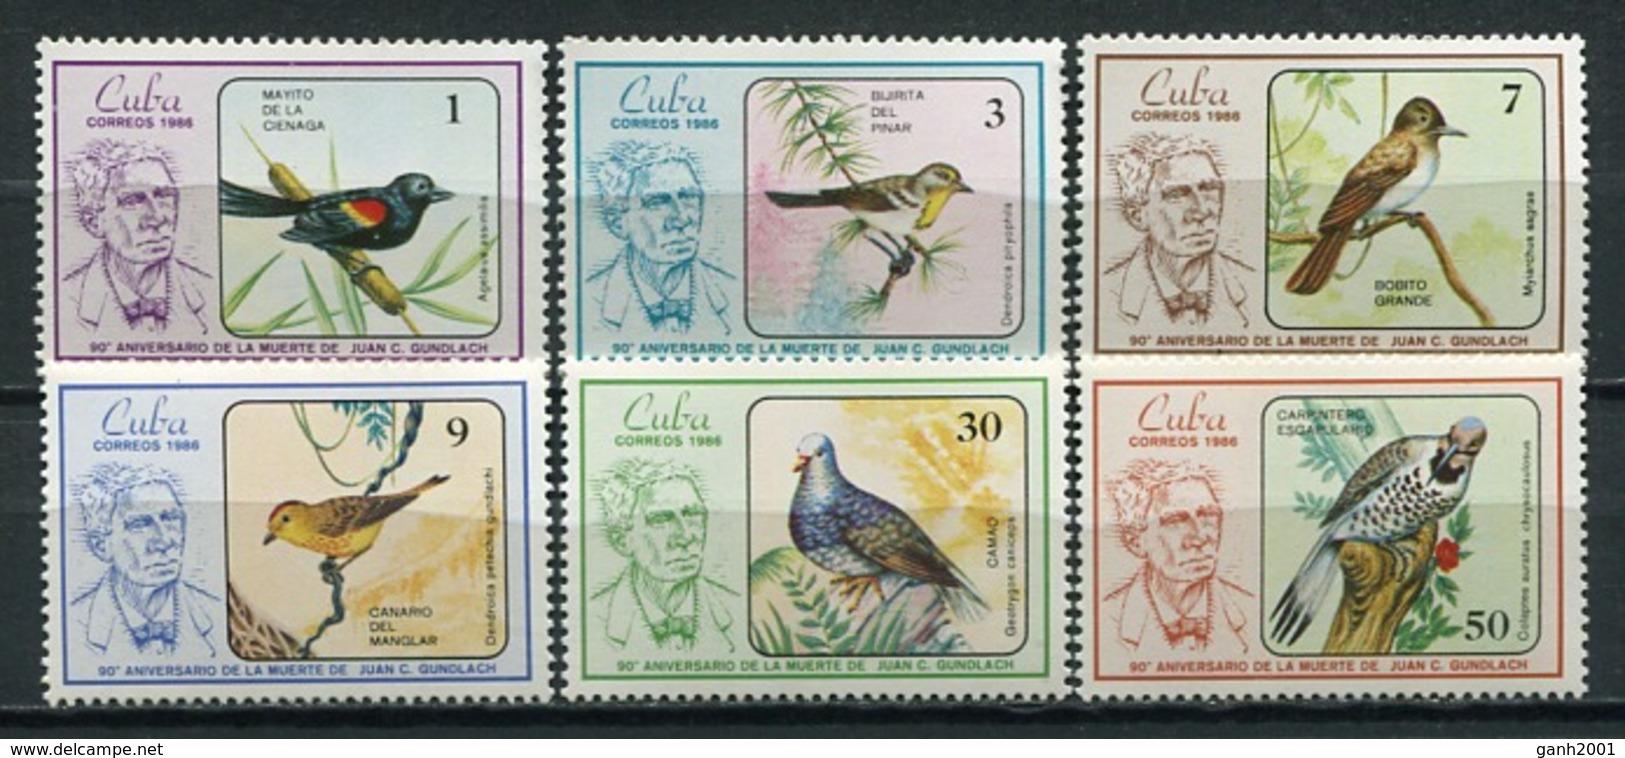 Cuba 1986 / Birds MNH Vögel Aves Oiseaux Uccelli / Cu8526  C3-7 - Pájaros